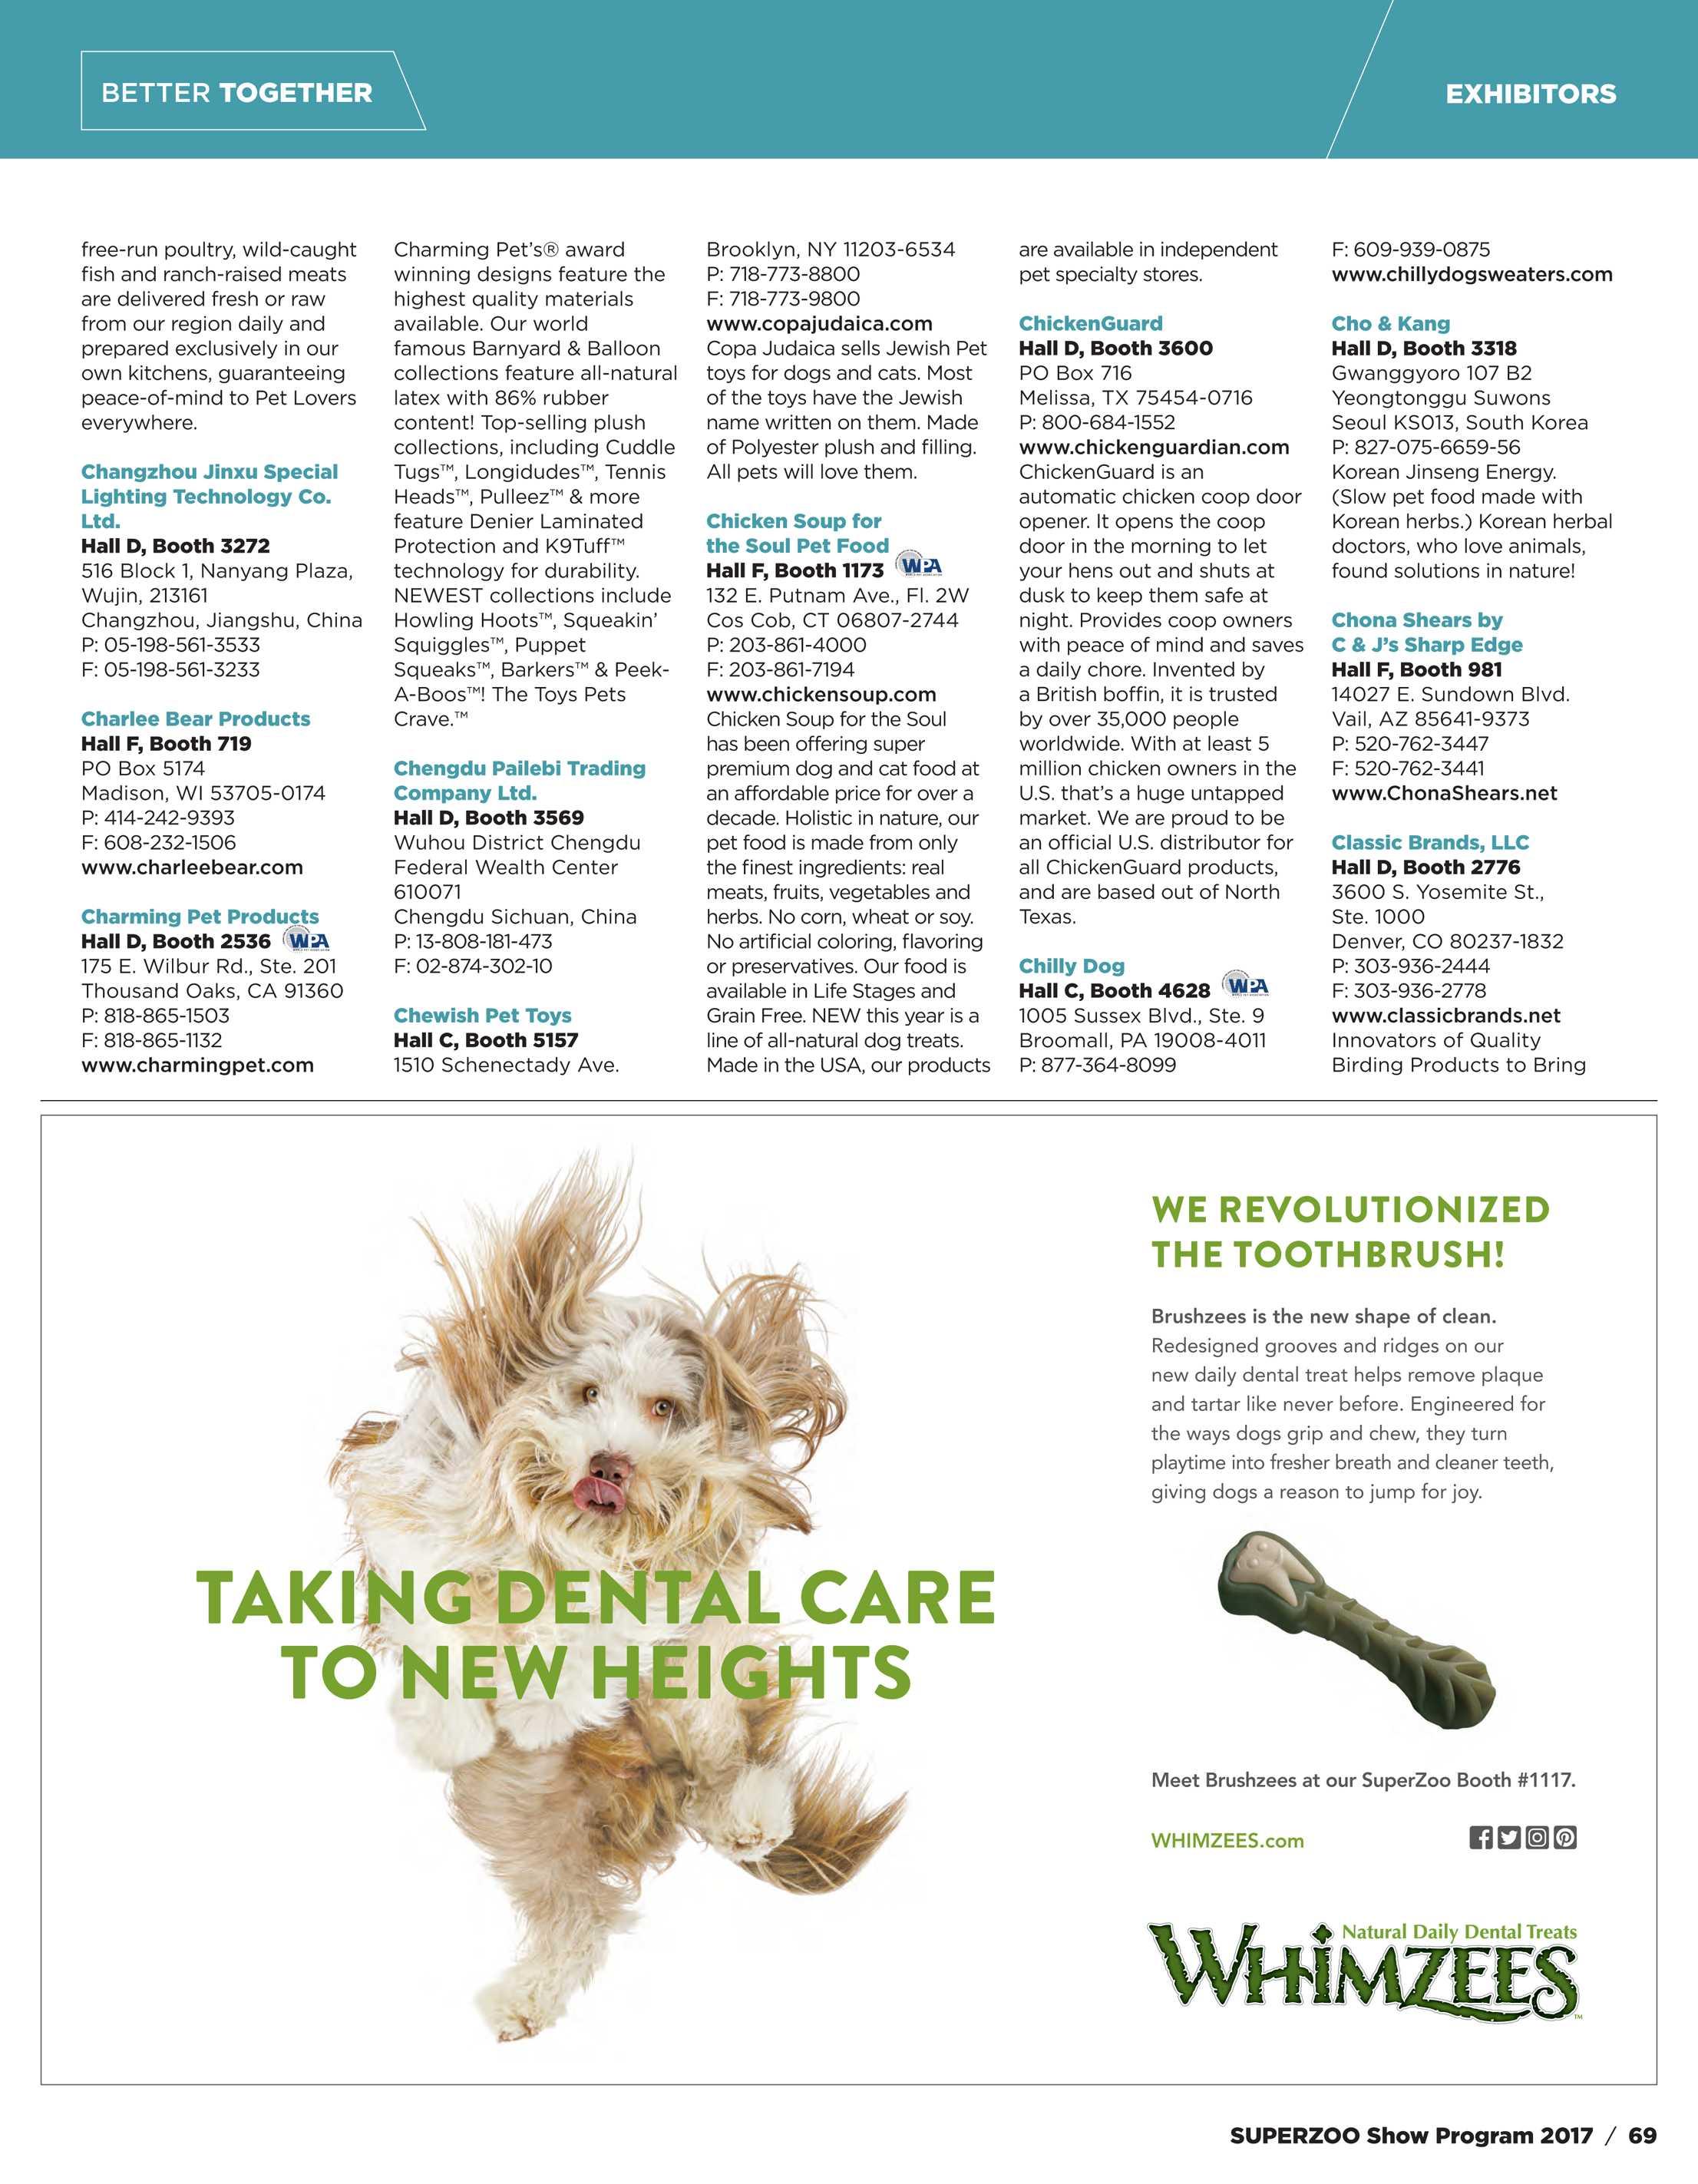 Pet Product News - SuperZoo Show Program 2017 - page 69